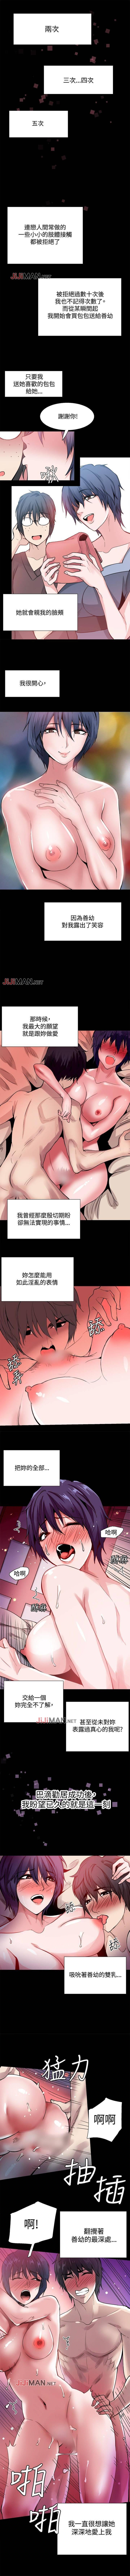 【已完结】Bodychange(作者:Seize & 死亡節奏) 第1~33话 112